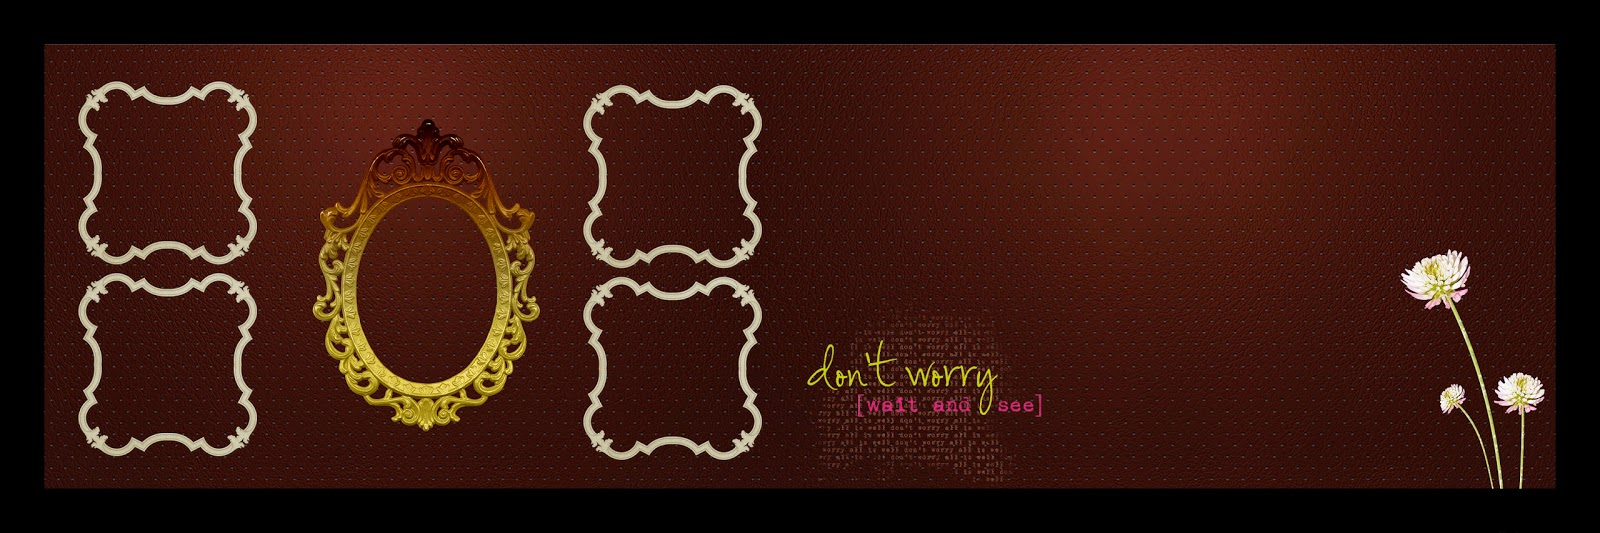 Wedding Album Design Psd 12x36 Freewallpaper Today